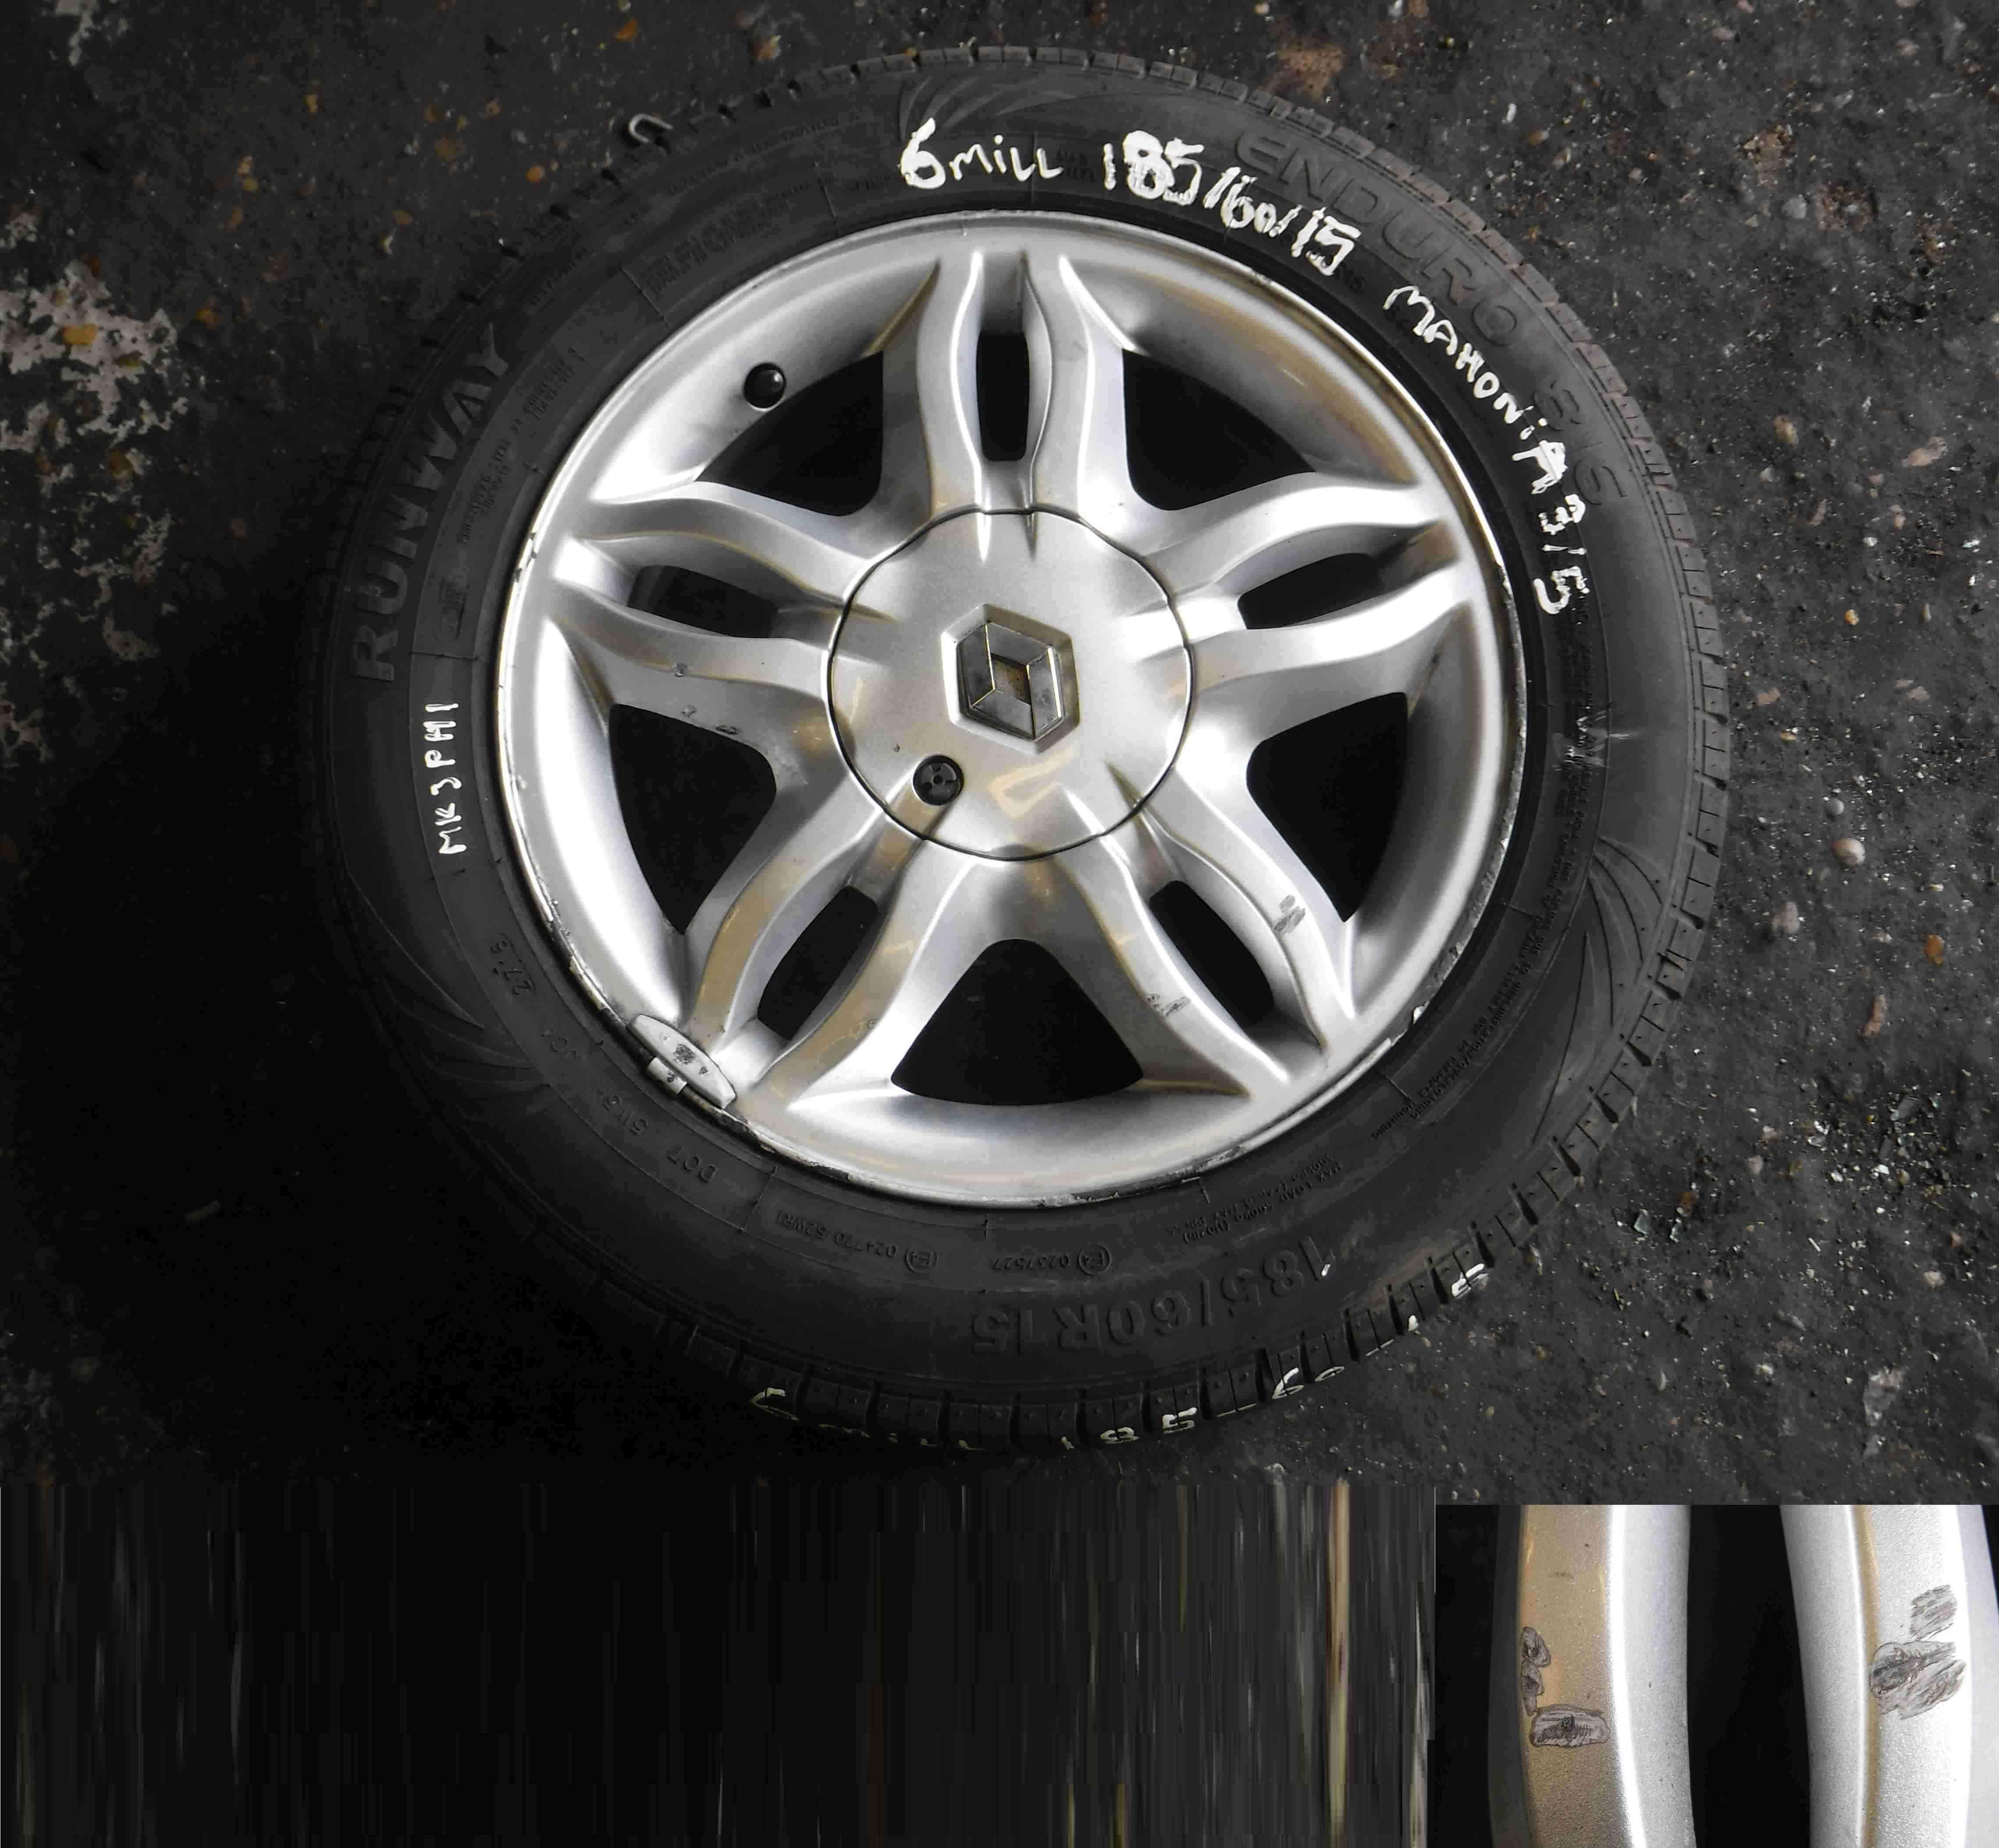 Renault Clio MK3 2005-2012 Mahonia Alloy Wheel  Tyre 185 60 15 6mm Tread 35